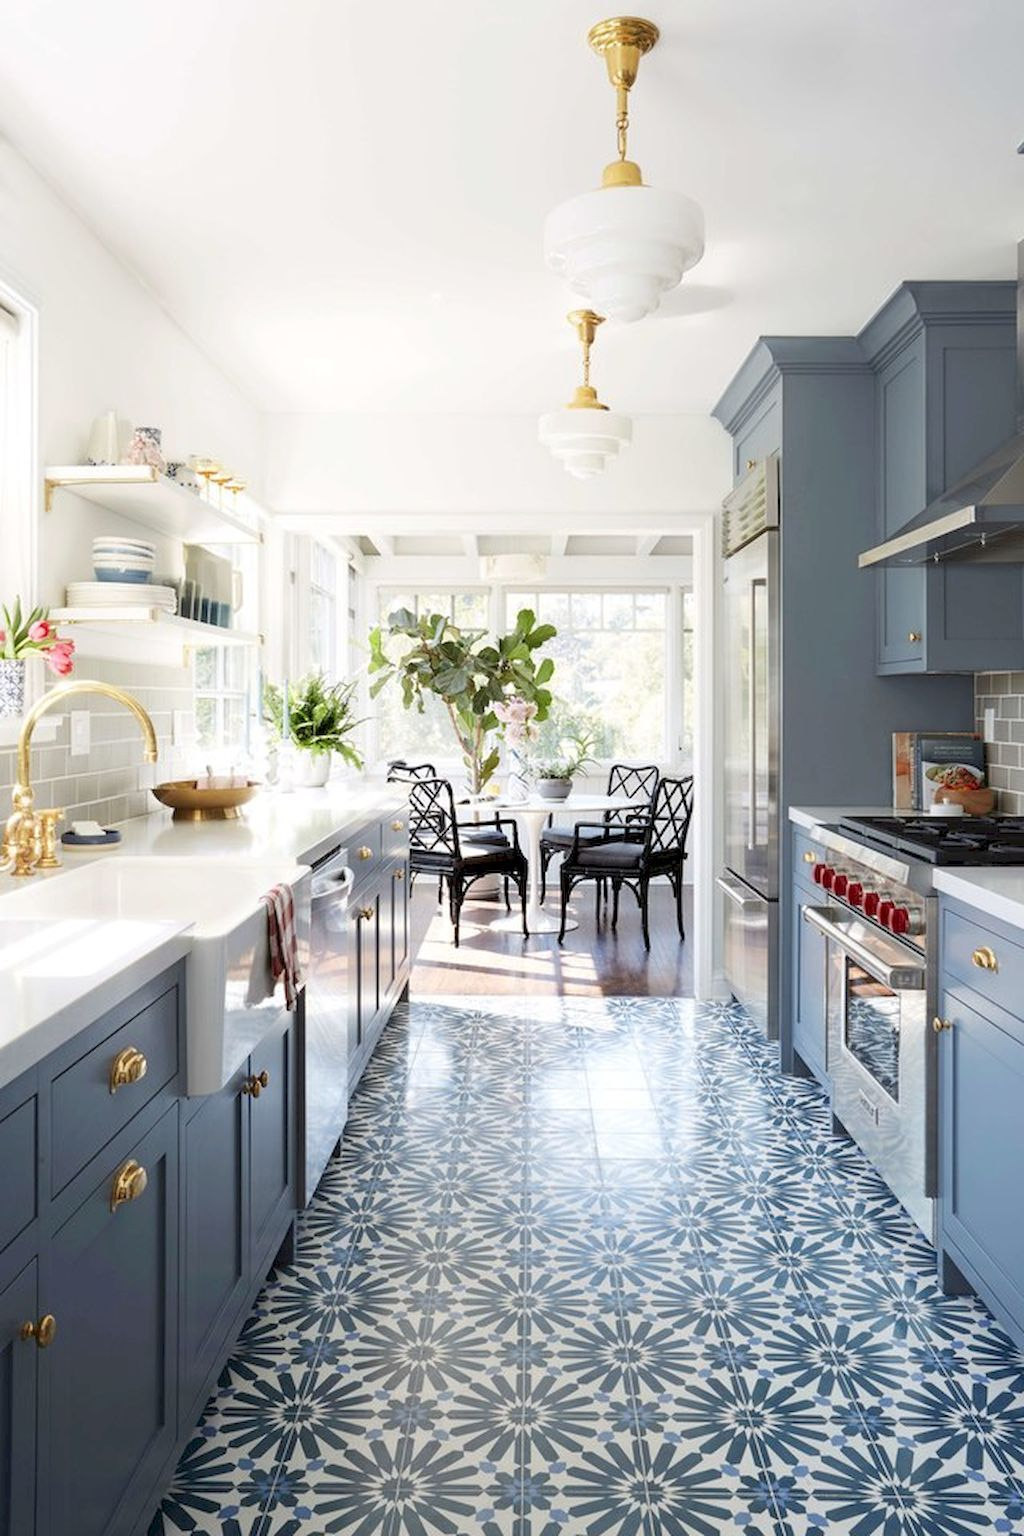 Best Beautiful Kitchen Decor Ideas On A Budget 17 Kitchen 400 x 300